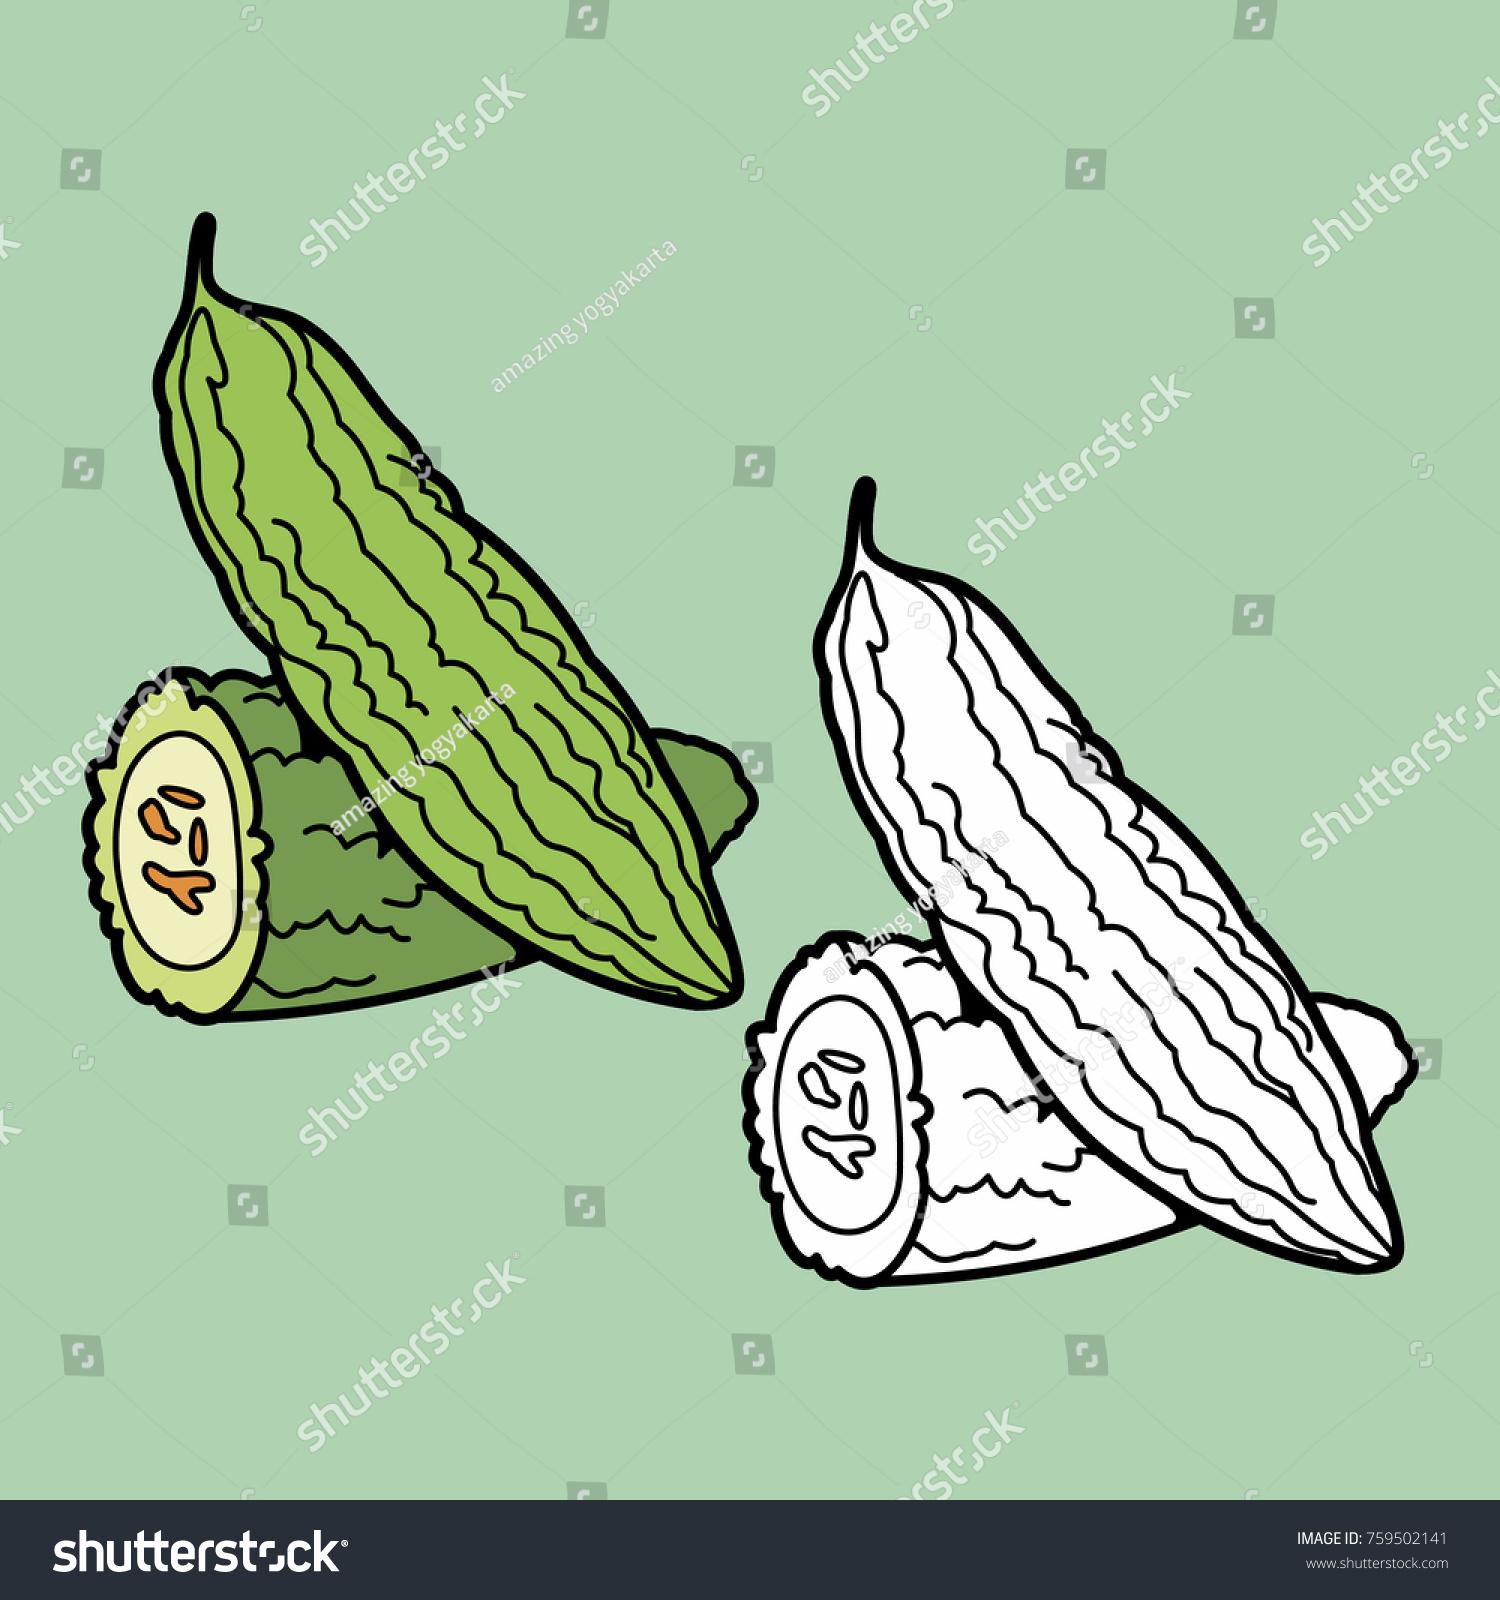 Coloring Illustration Kids Fruits Vegetables Stock Vector (Royalty ...